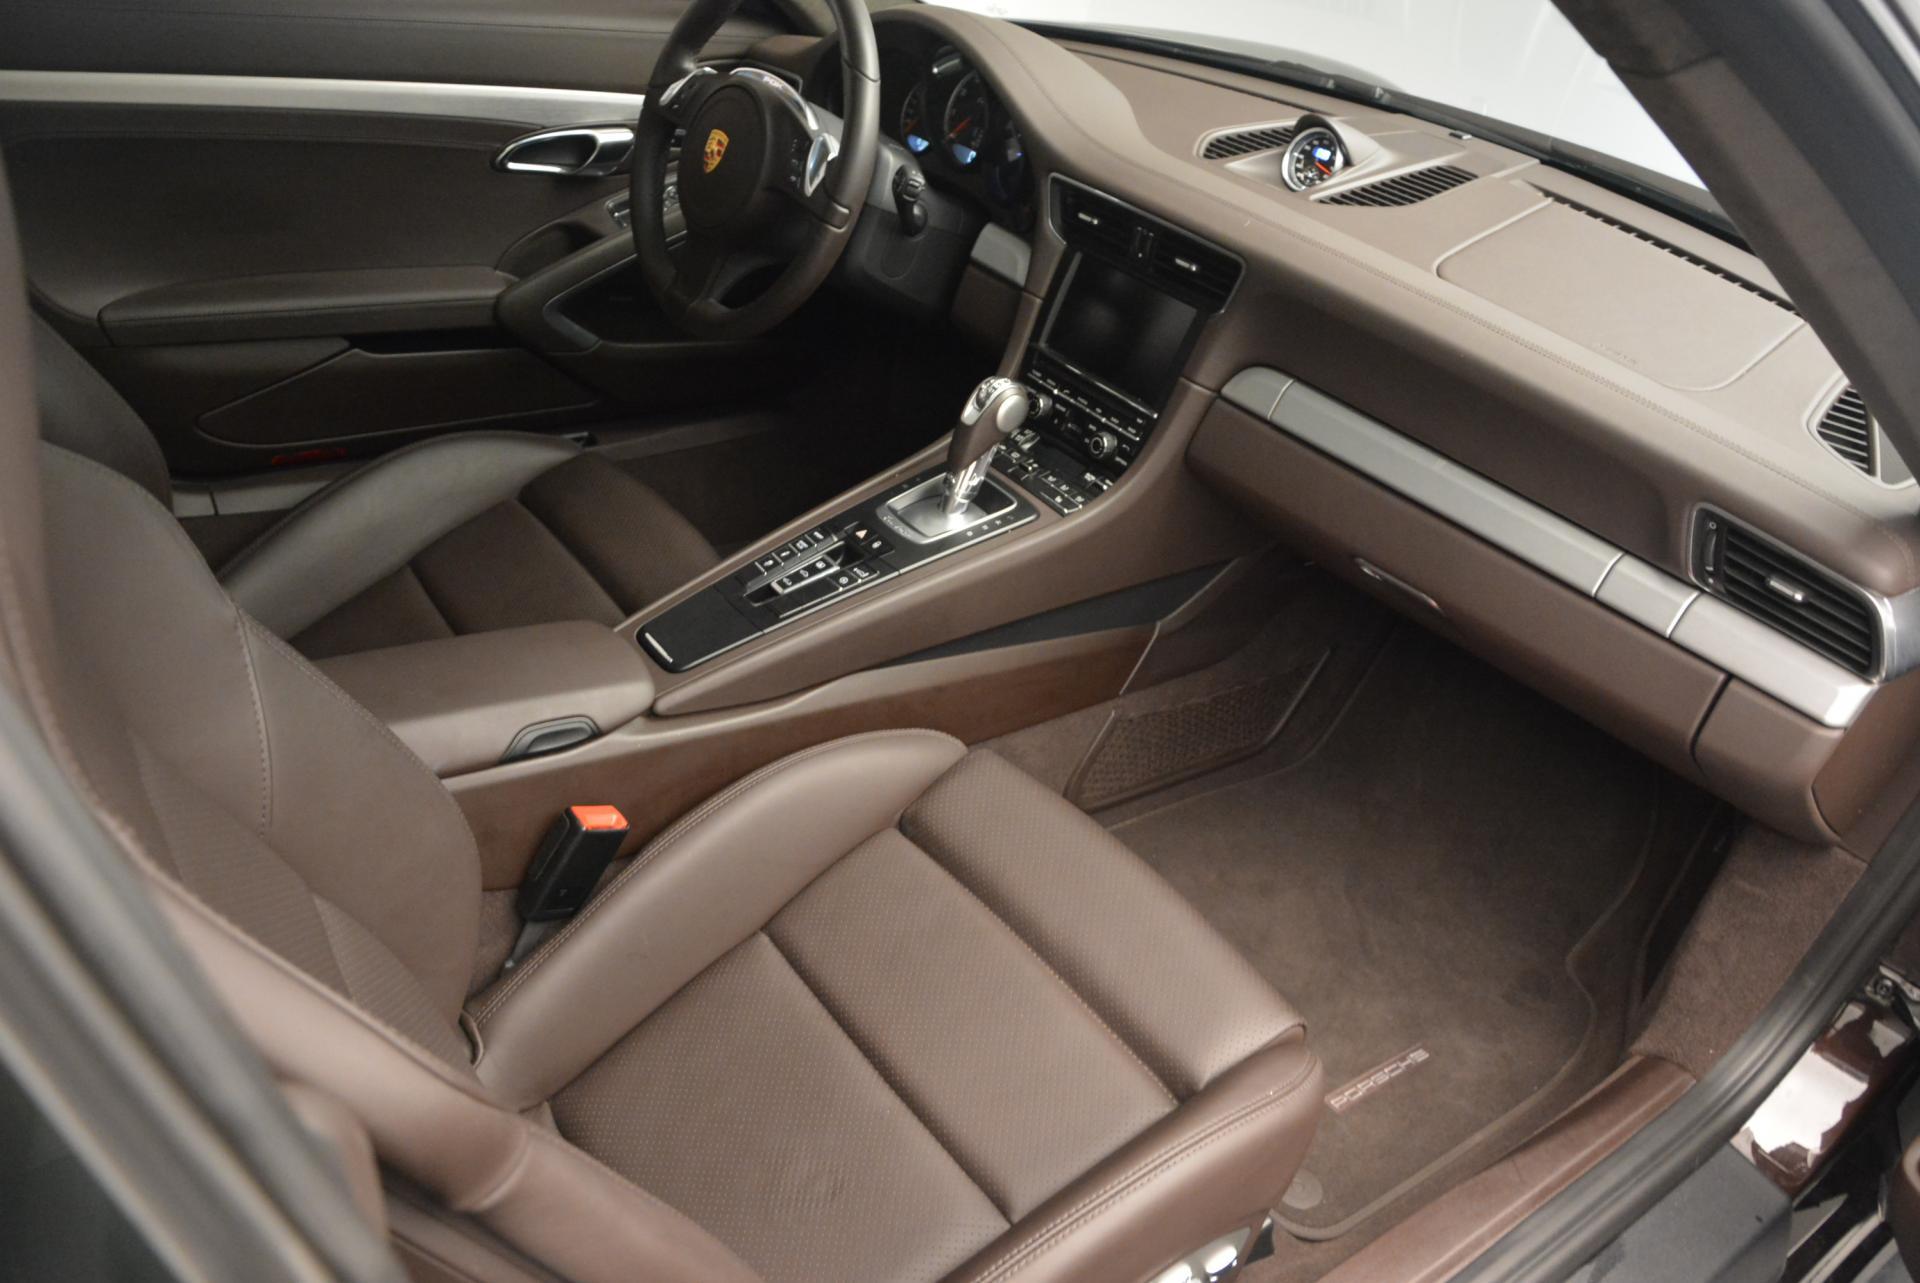 Used 2014 Porsche 911 Turbo For Sale In Westport, CT 111_p21